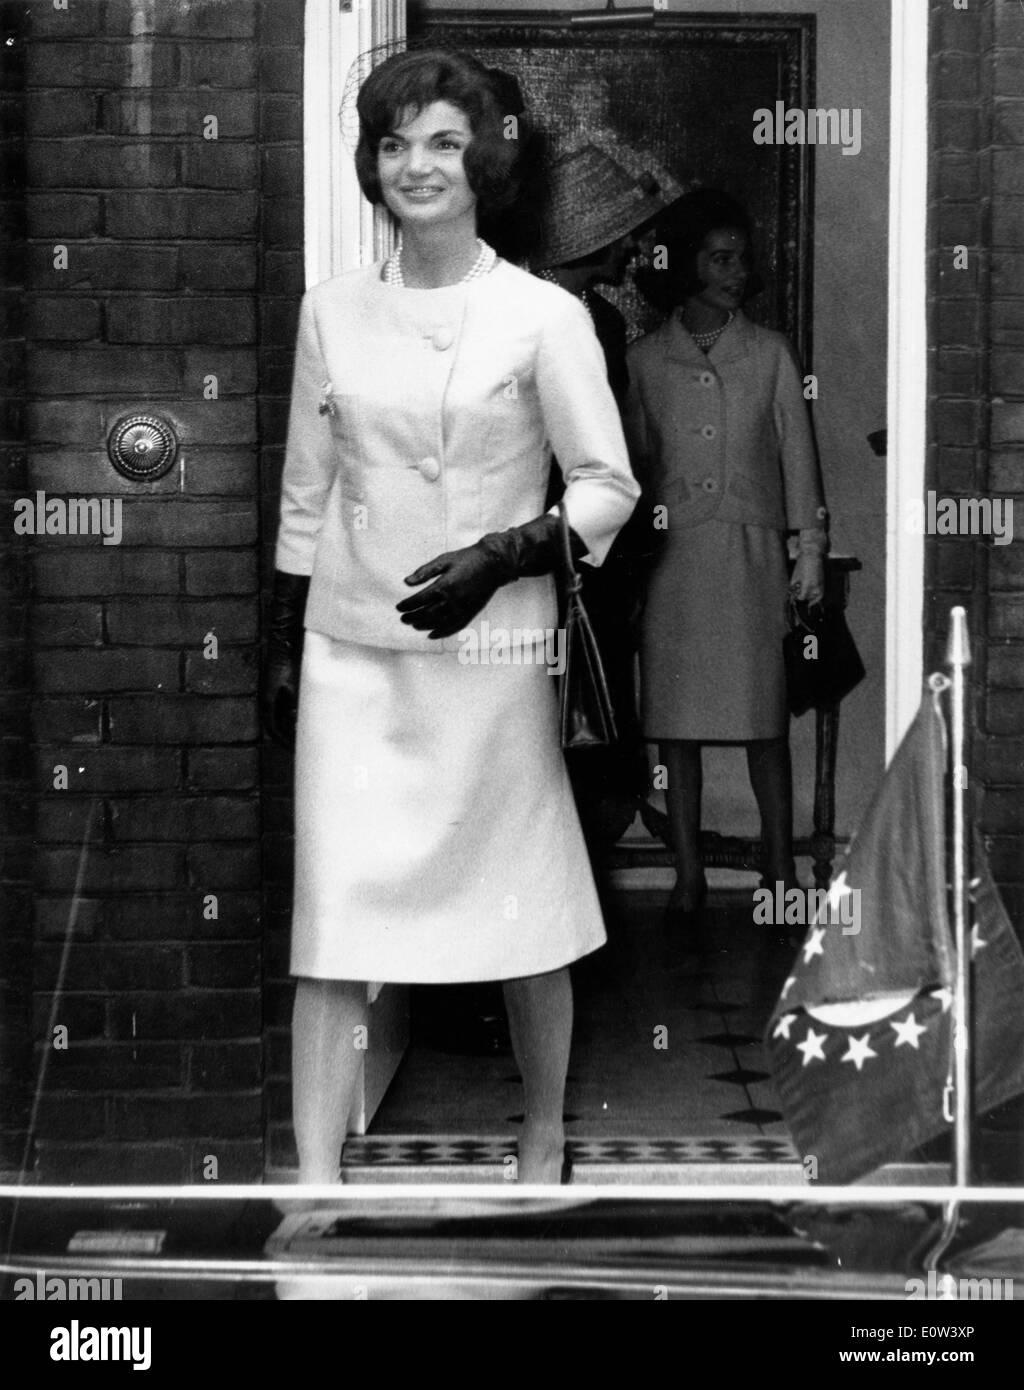 First Lady Jacqueline Kennedy leaving Buckingham Palace - Stock Image